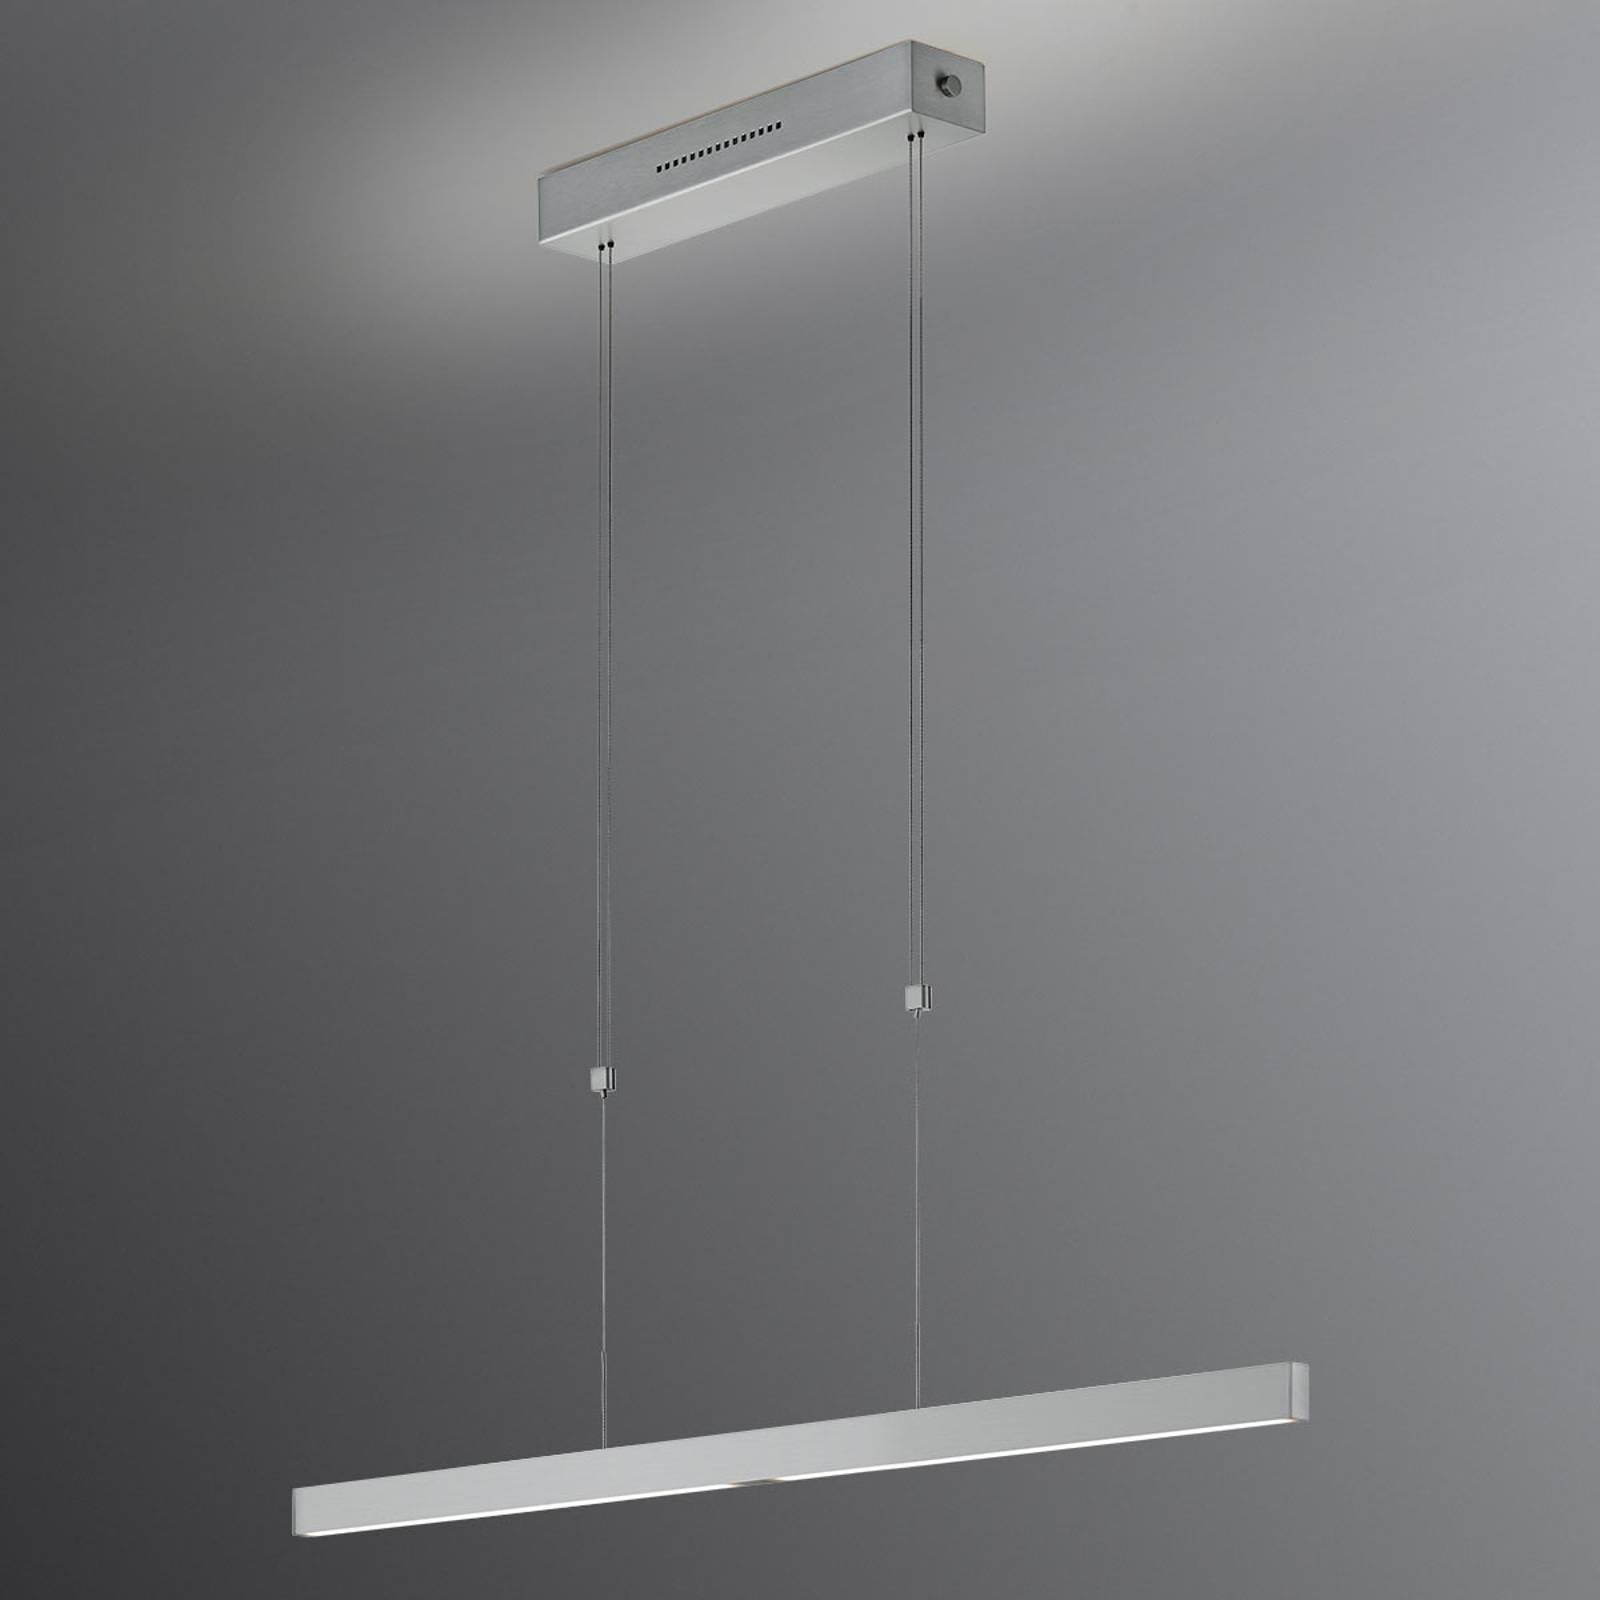 Pia-LED-riippuvalo, eletunnistin, nikkeliä 68 cm